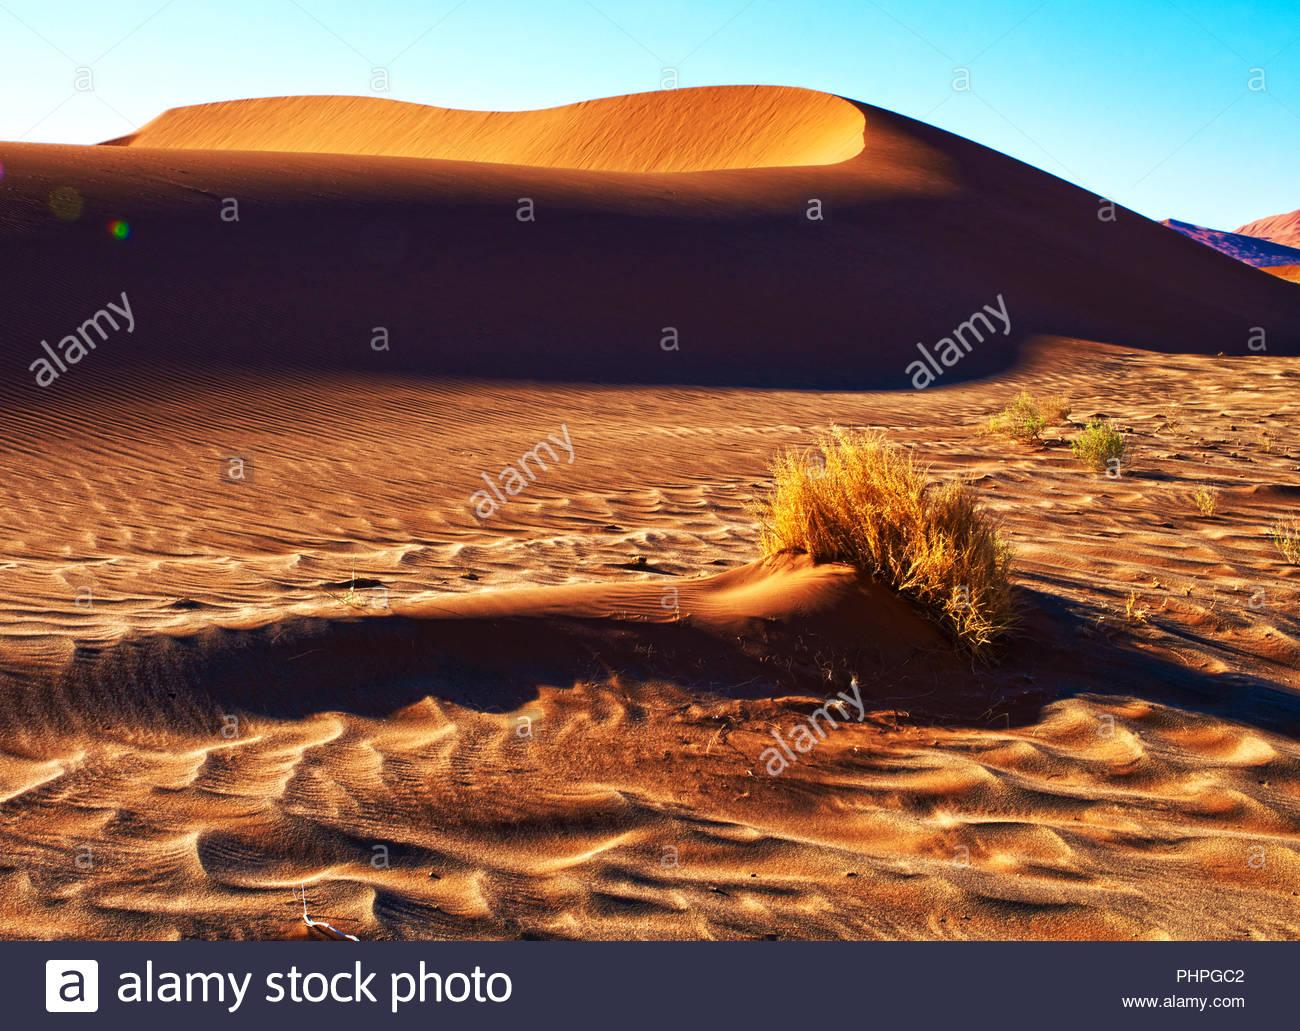 Desert landscape in Namibia - Stock Image